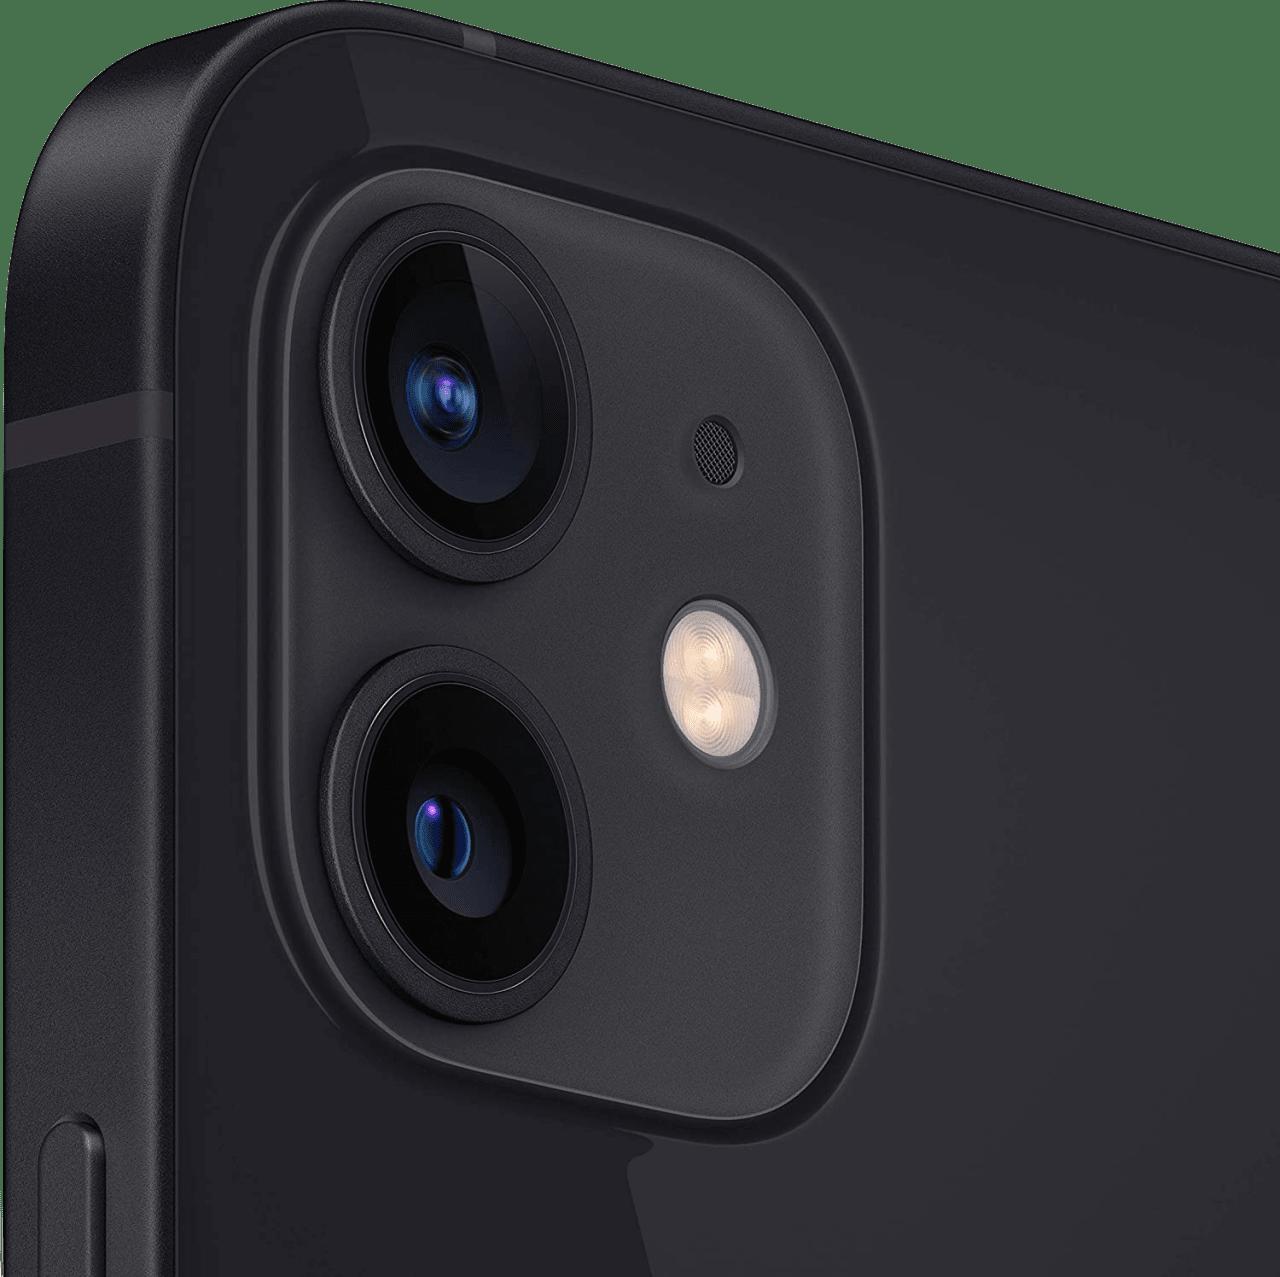 Black Apple iPhone 12 mini 128GB.4